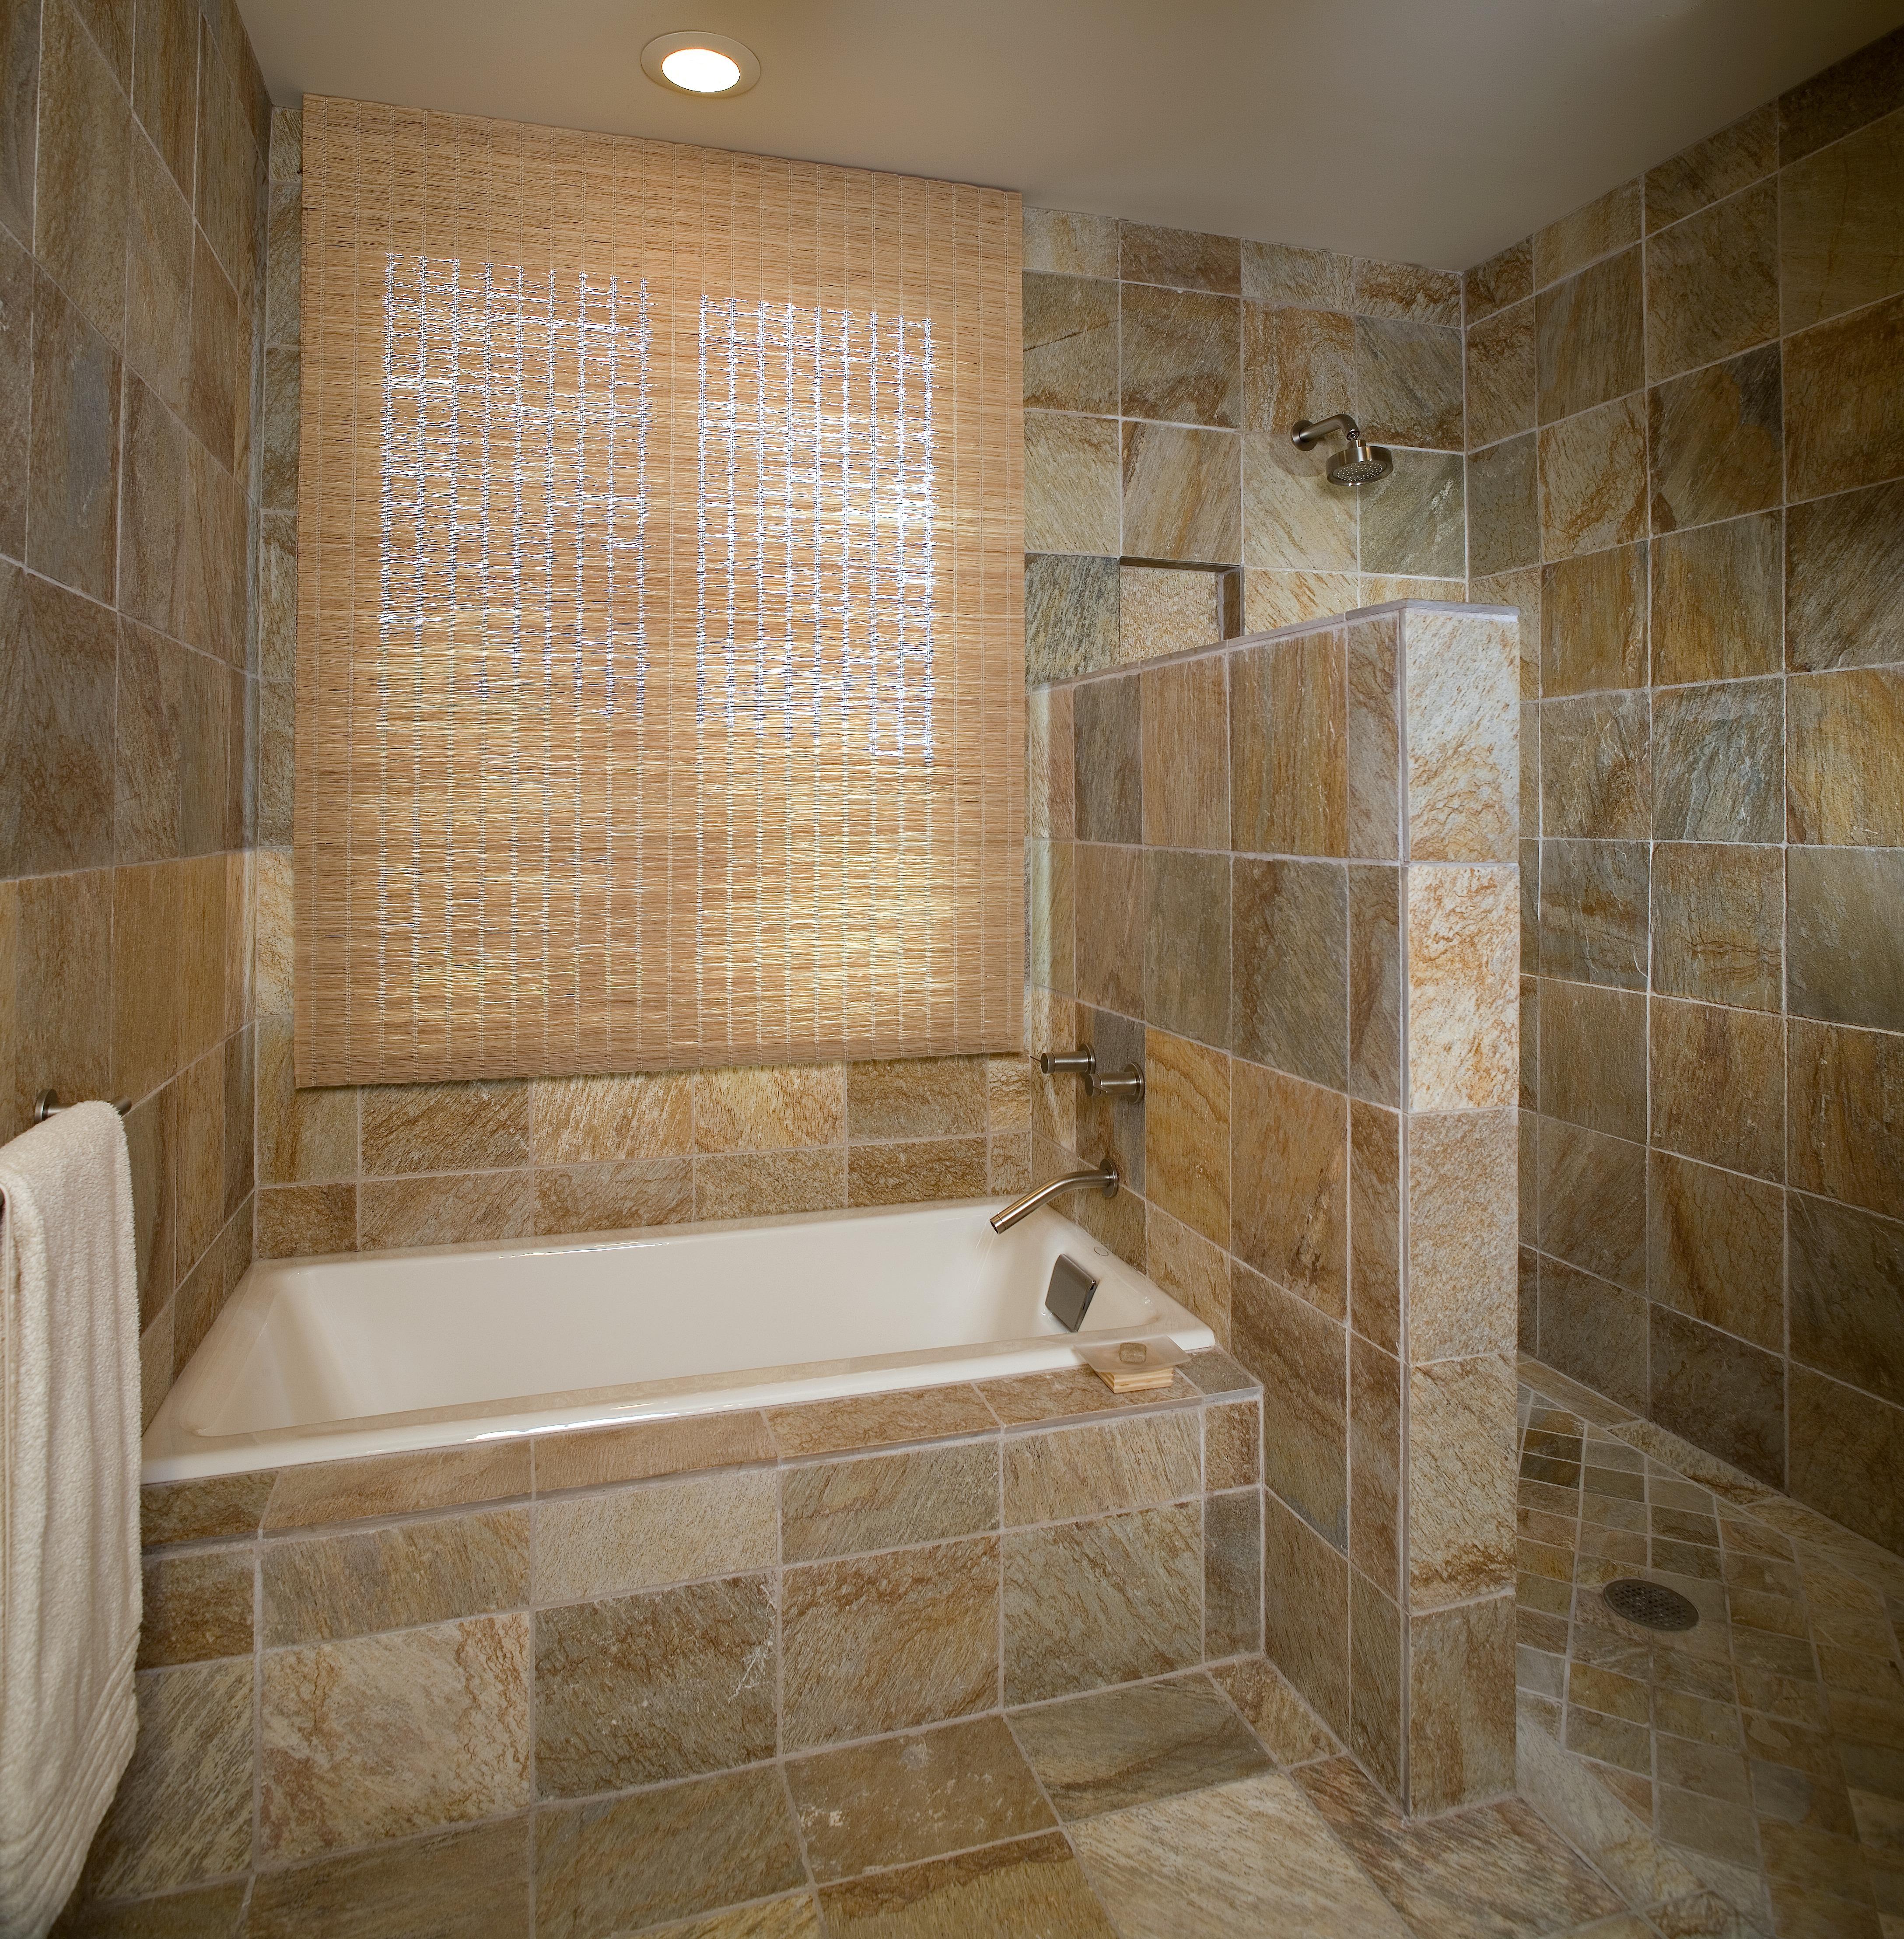 Best Kitchen Gallery: Where Does Your Money Go For A Bathroom Remodel Homeadvisor of Designing A Bathroom Remodel  on rachelxblog.com